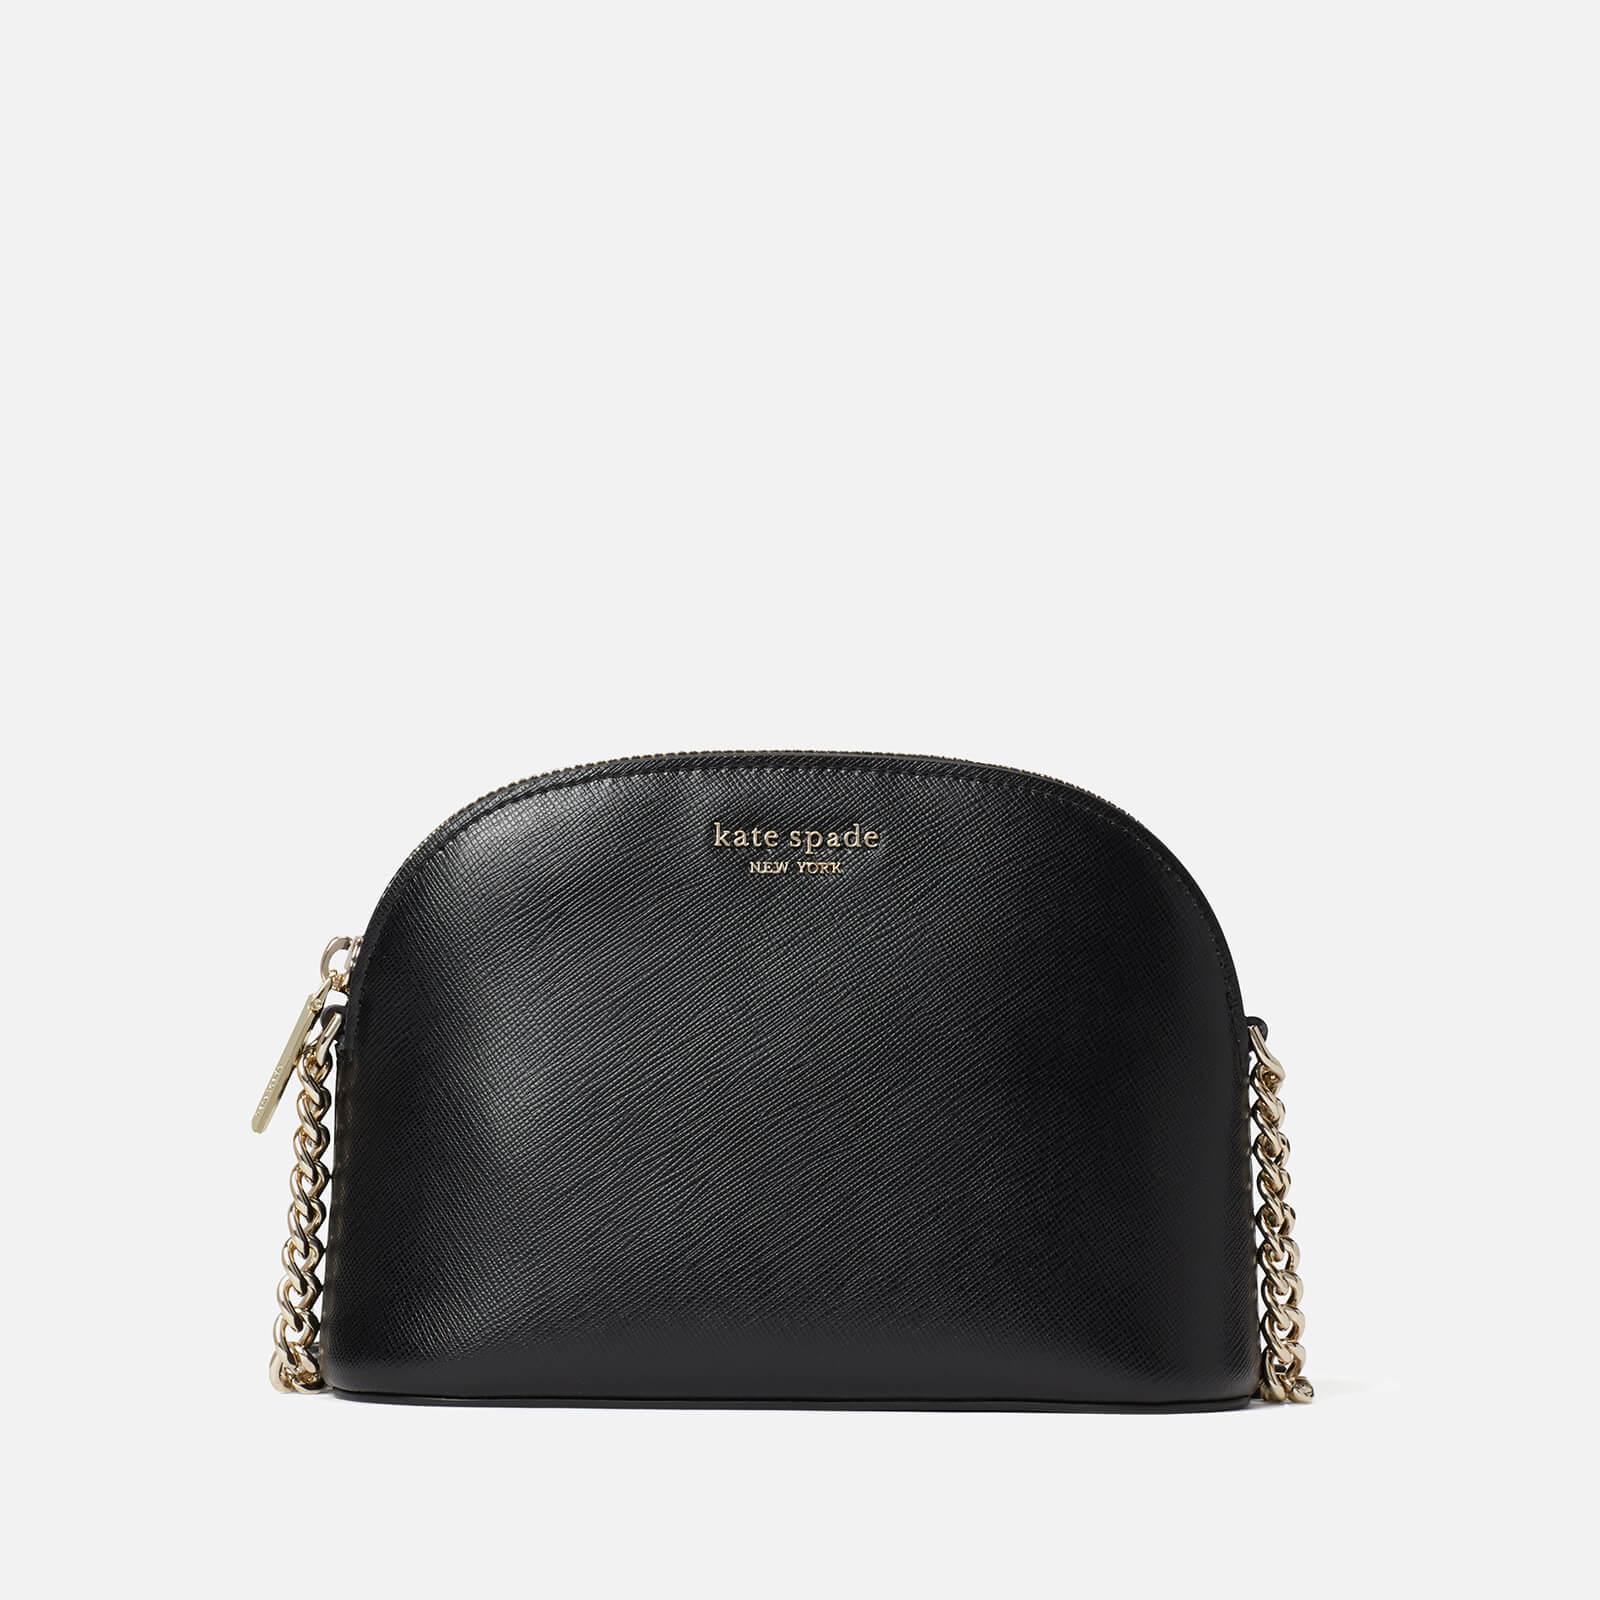 Kate Spade New York Women's Spencer Small Dome Crossbody Bag - Black